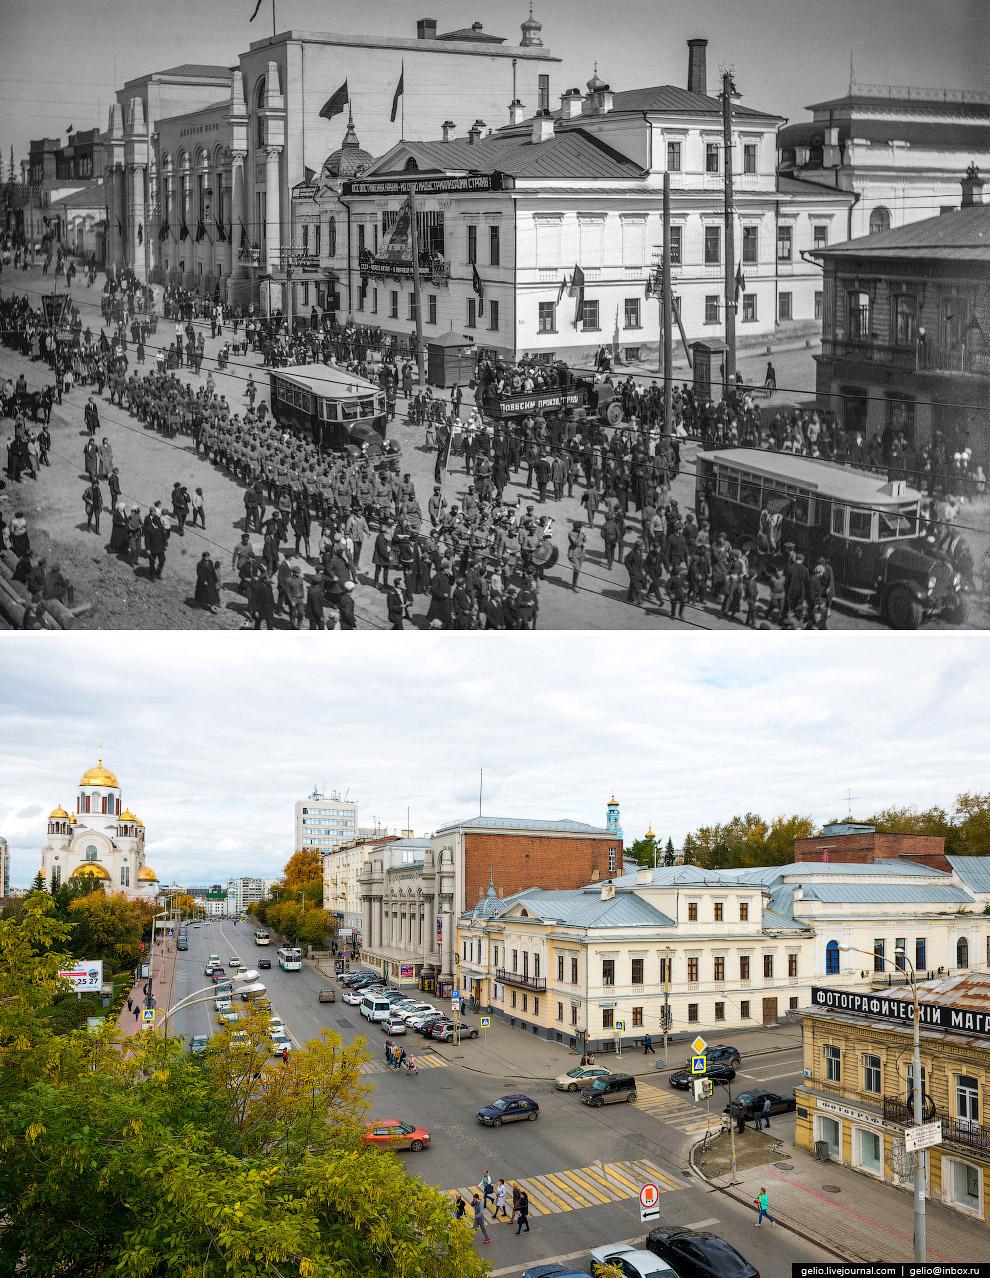 Фотографический музей Метенкова